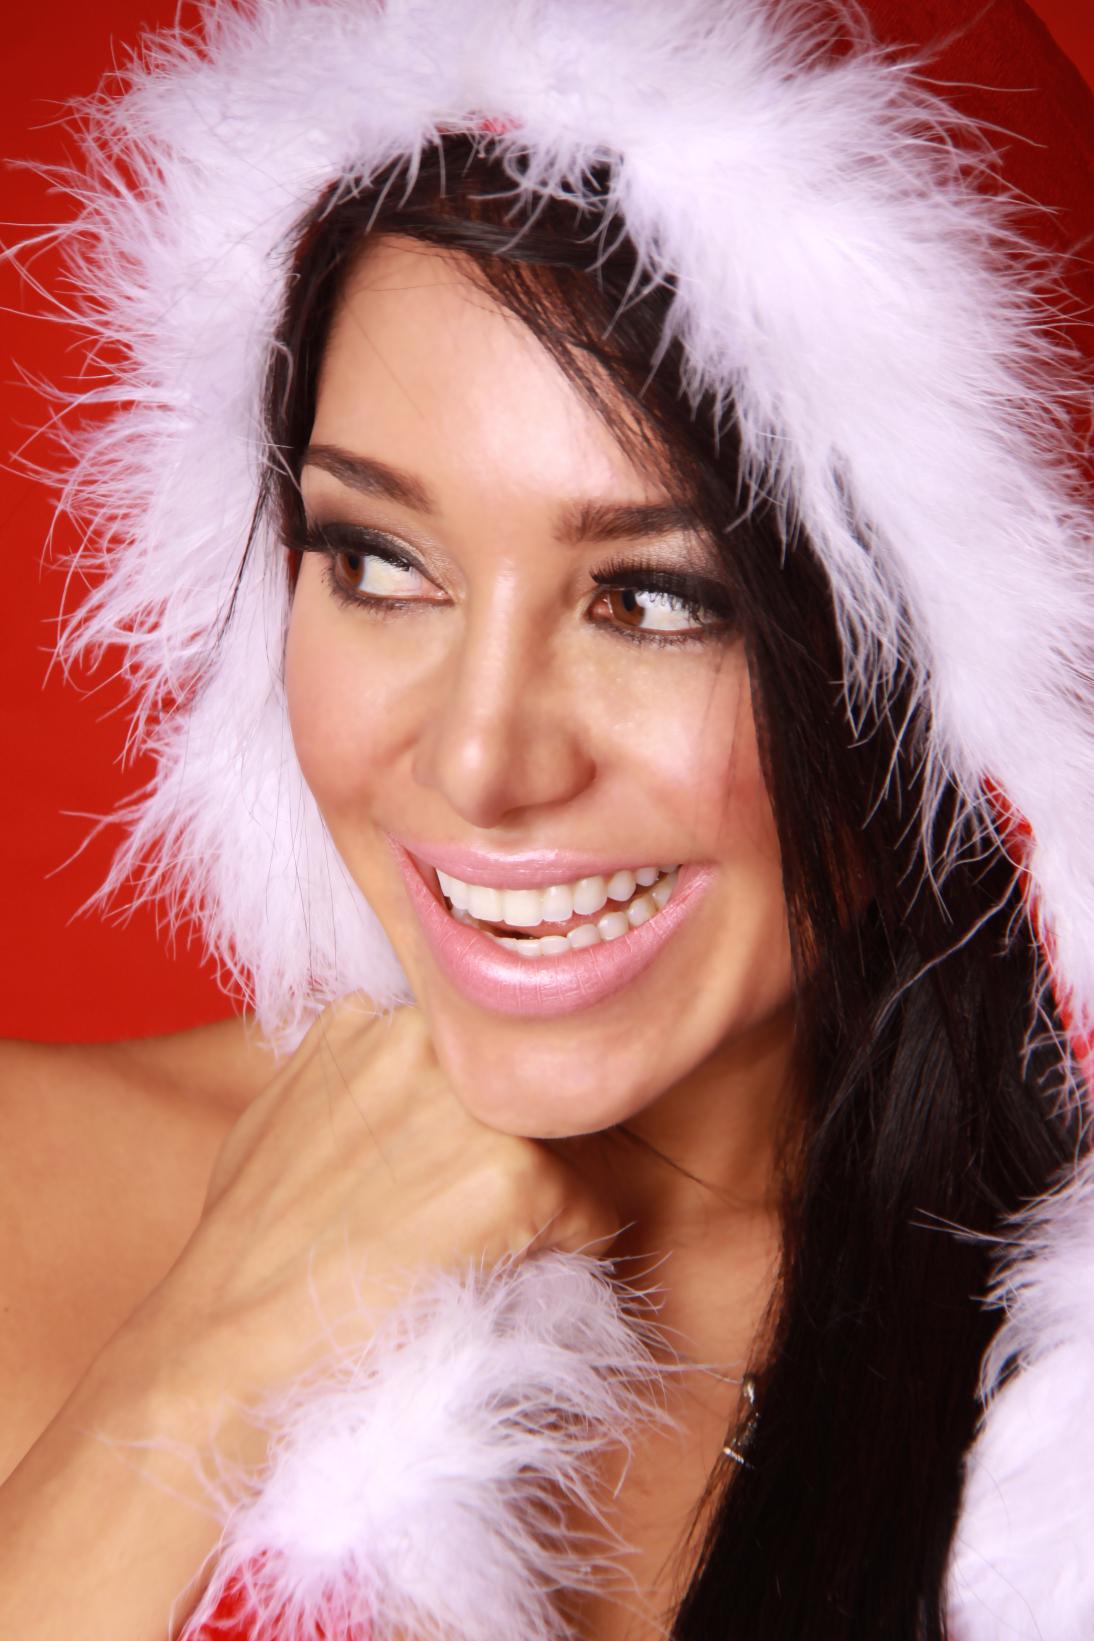 Andrea Calle, Karttos studio, bikini, christmas